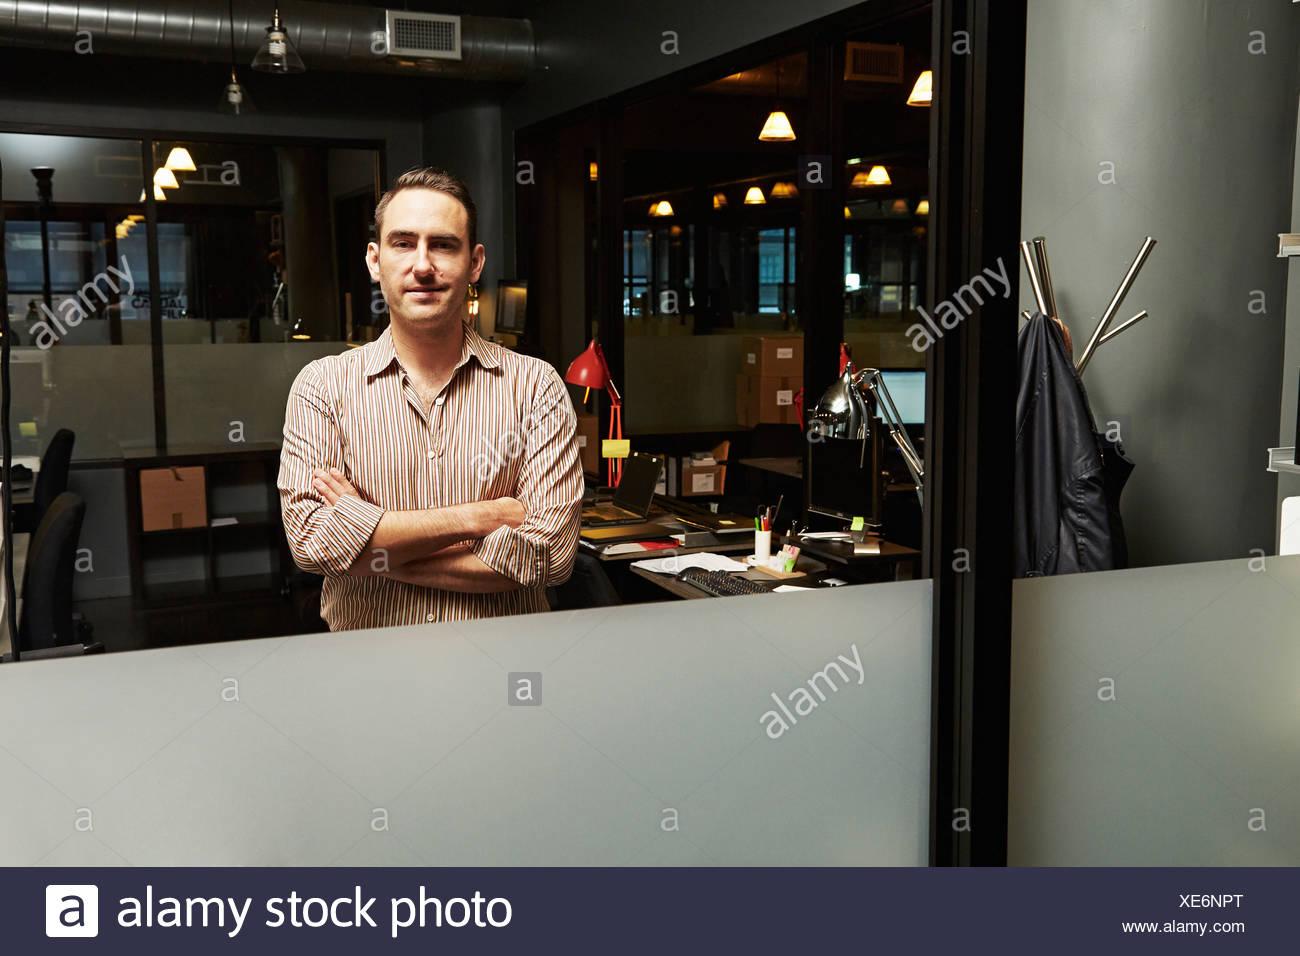 Porträt der Geschäftsmann mit verschränkten Armen Stockbild